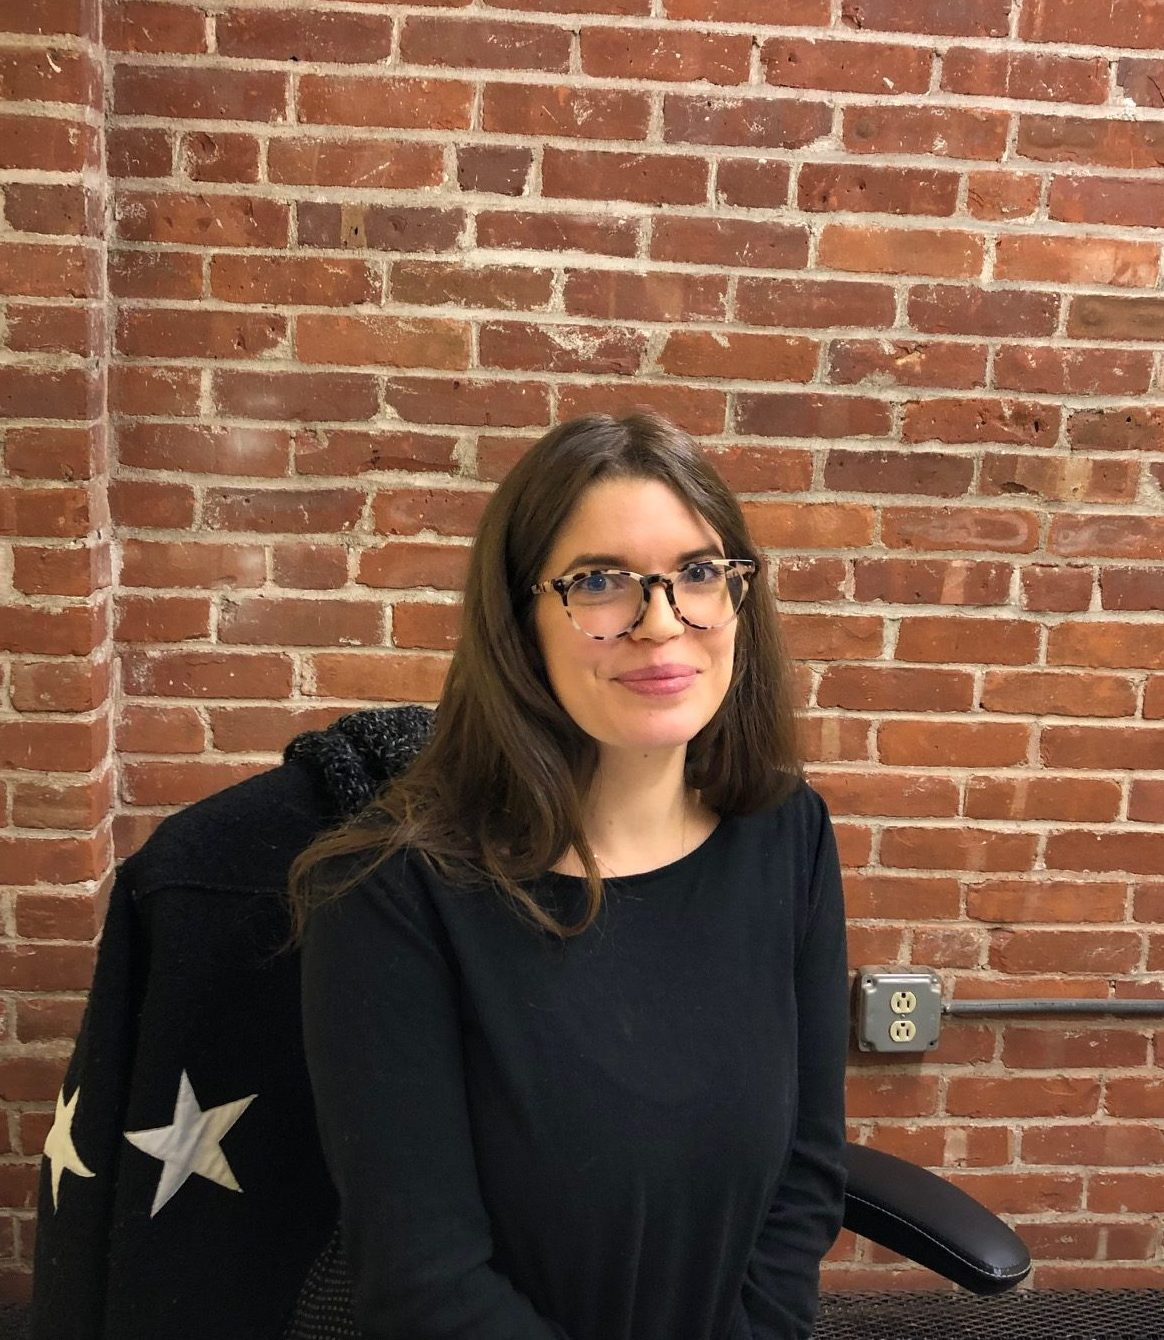 Melissa V. Salzmann, Project Manager